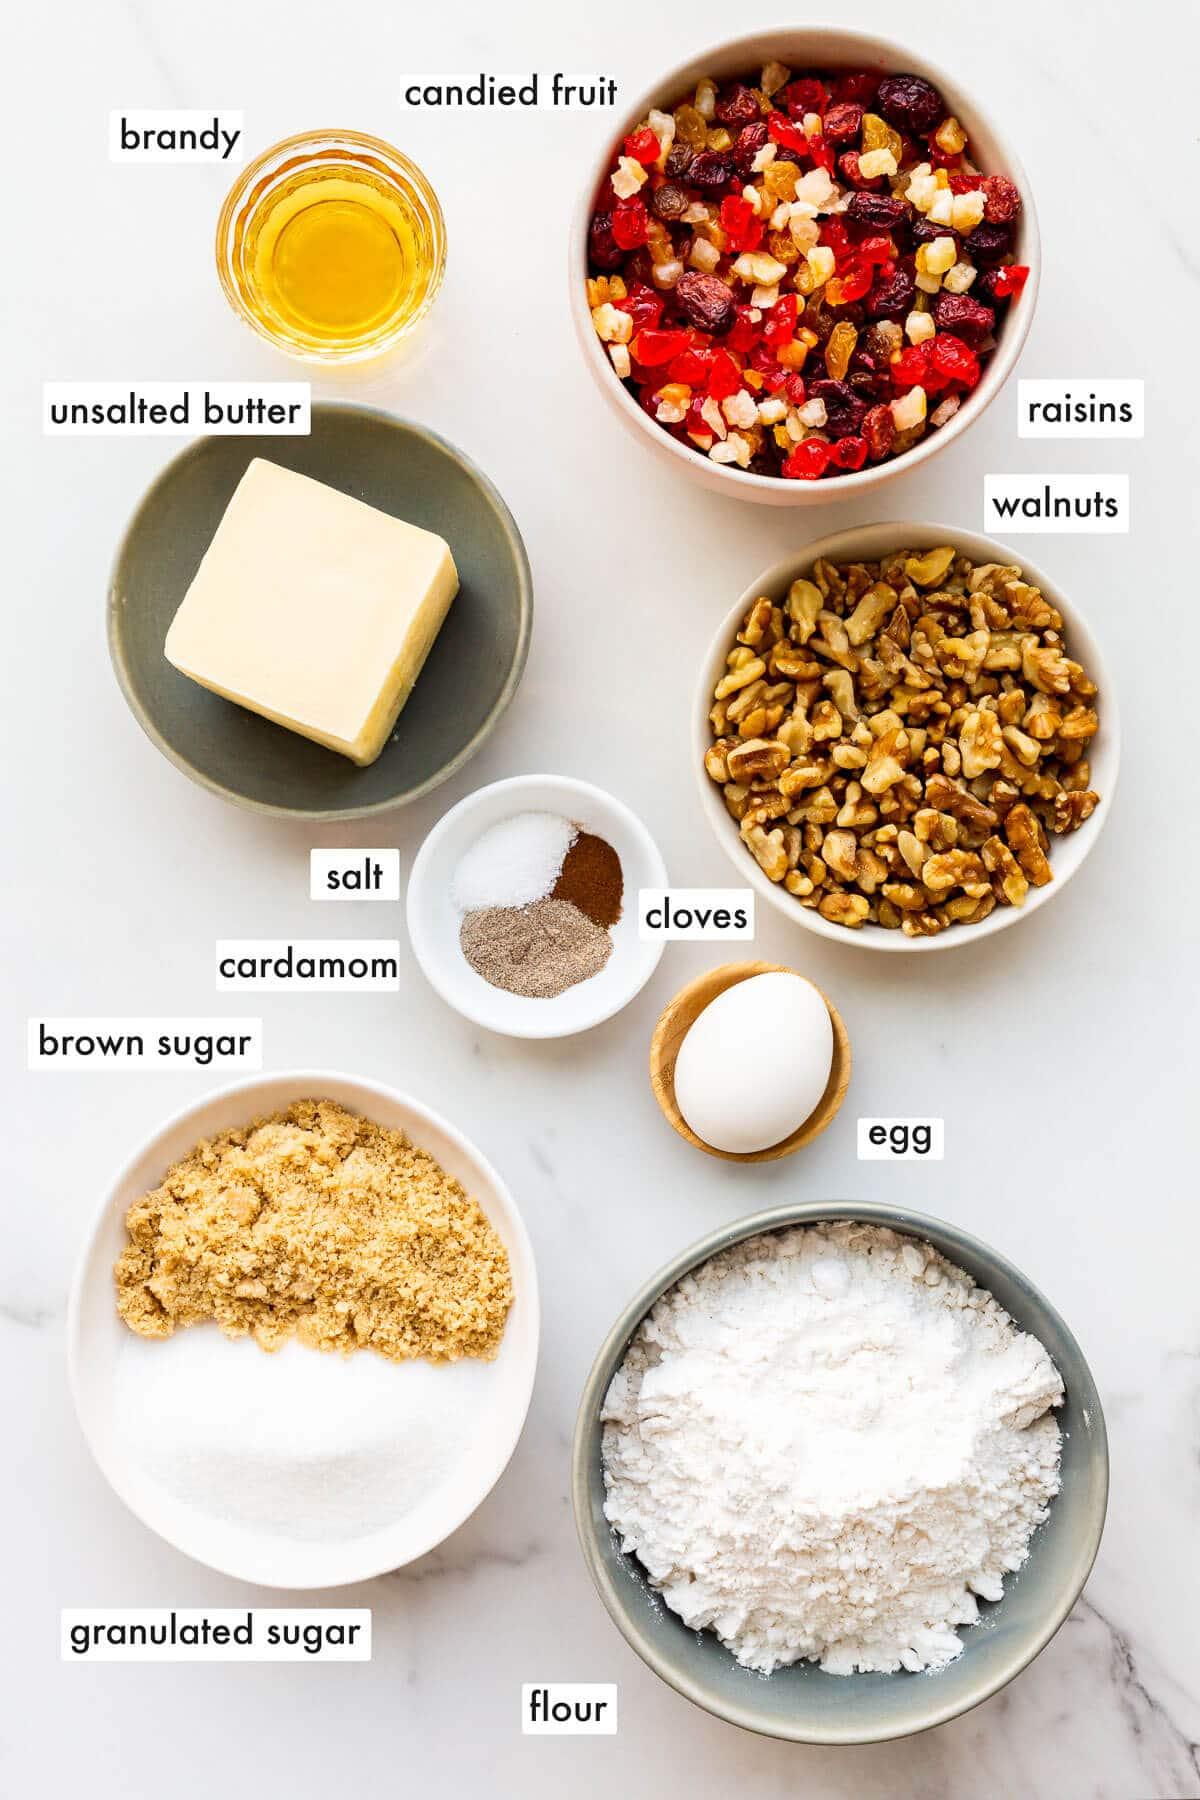 Ingredients to make fruitcake cookies measured out.